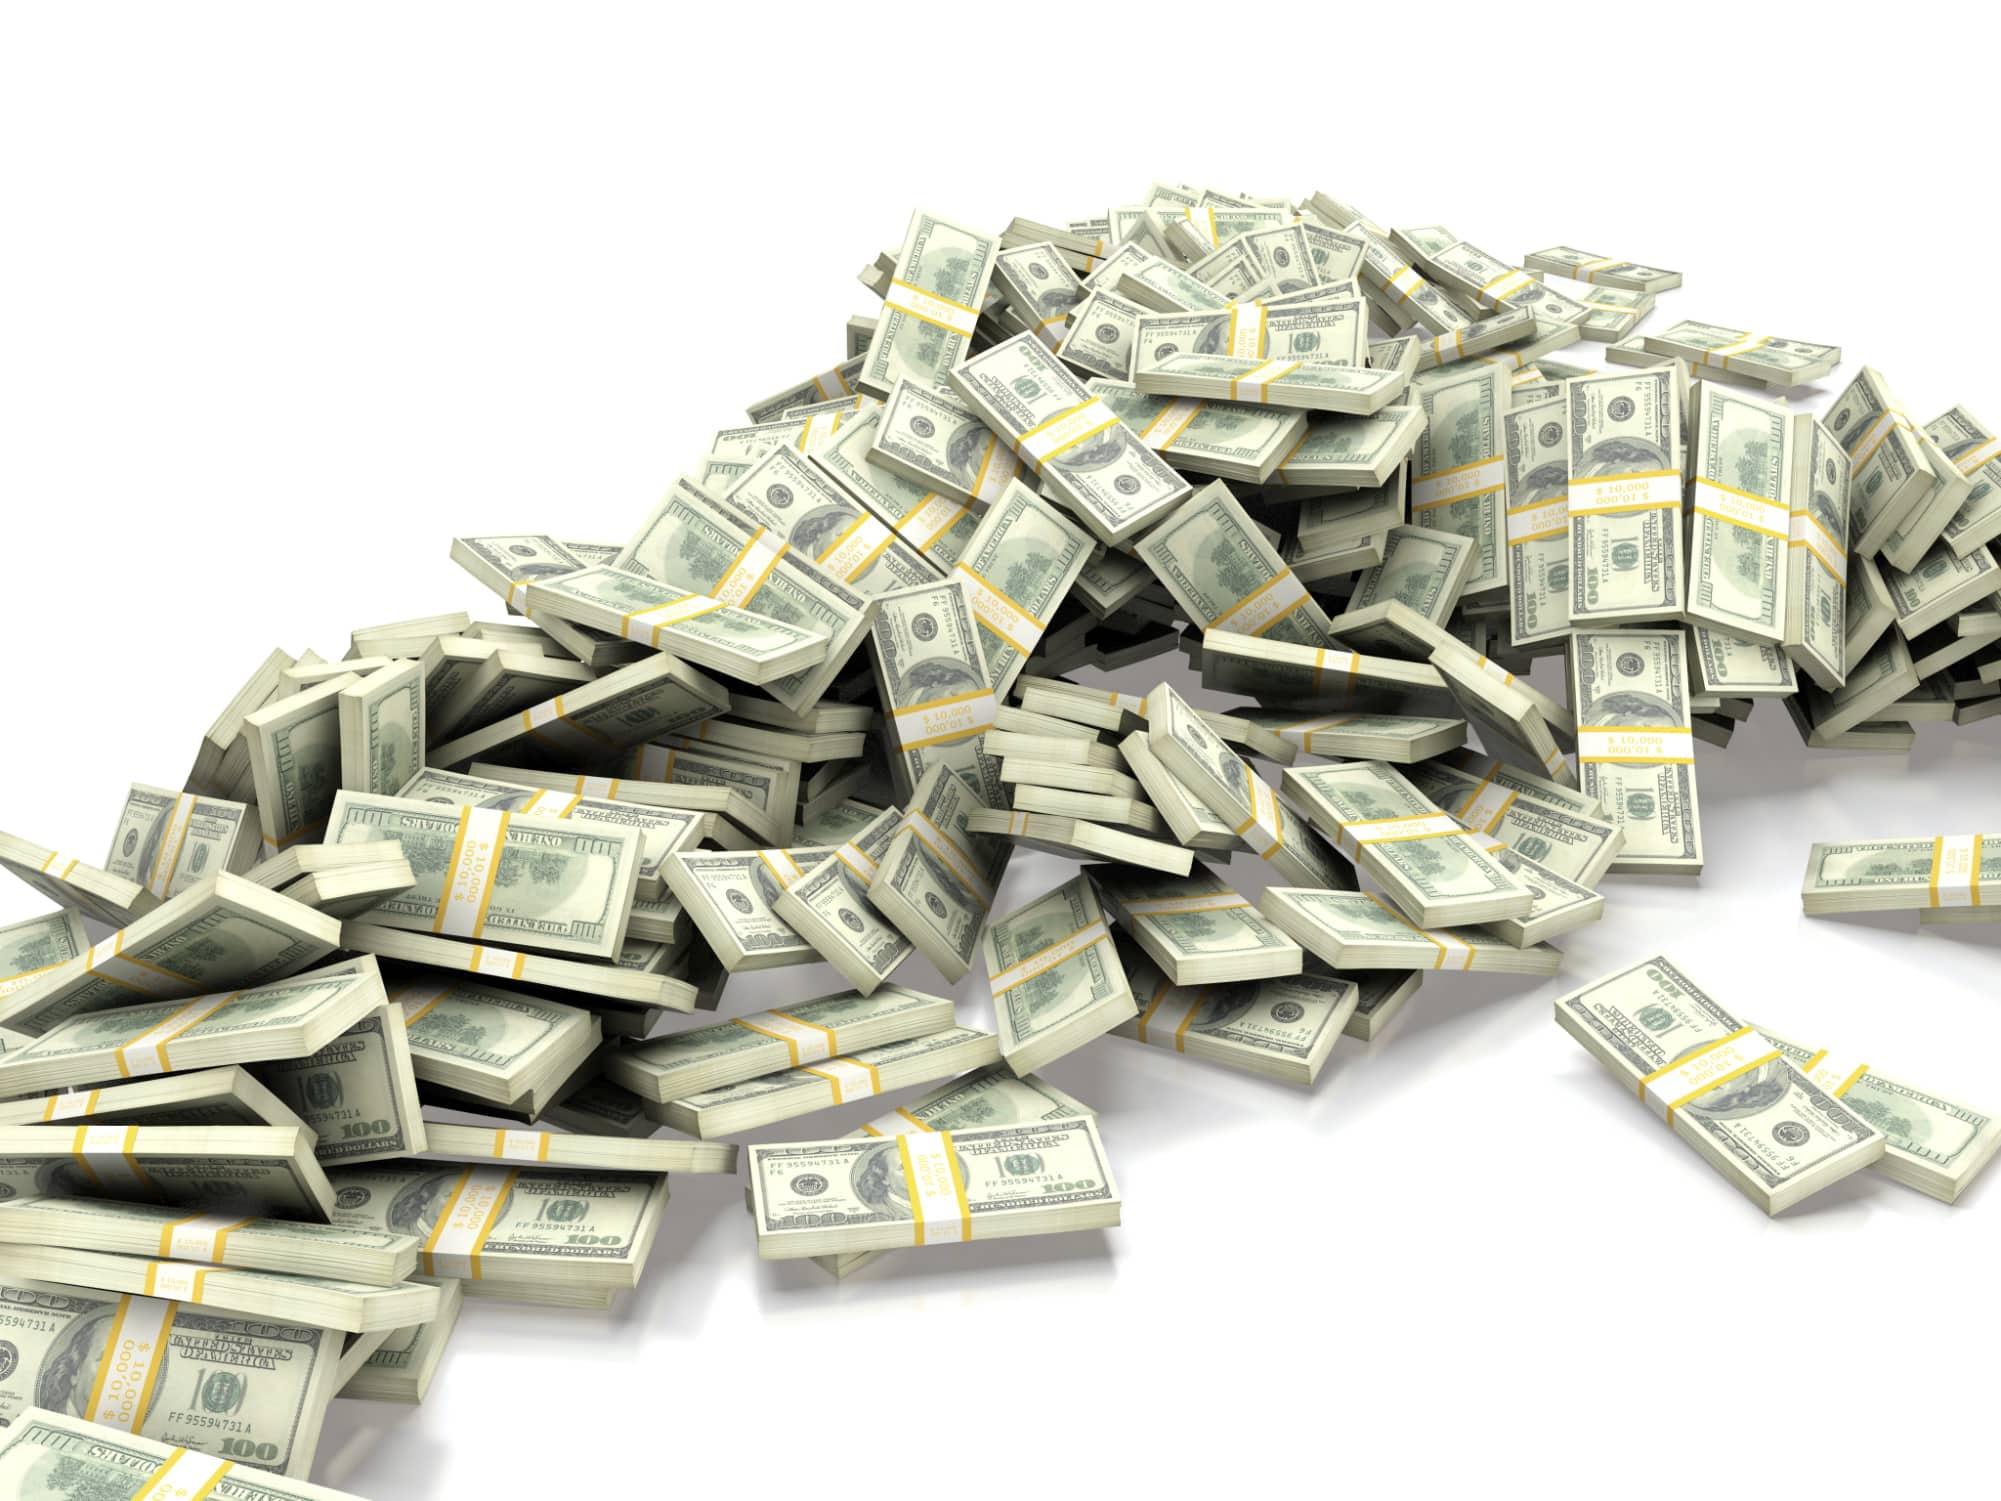 California ticket-holder hits $1.6 bn lottery jackpot